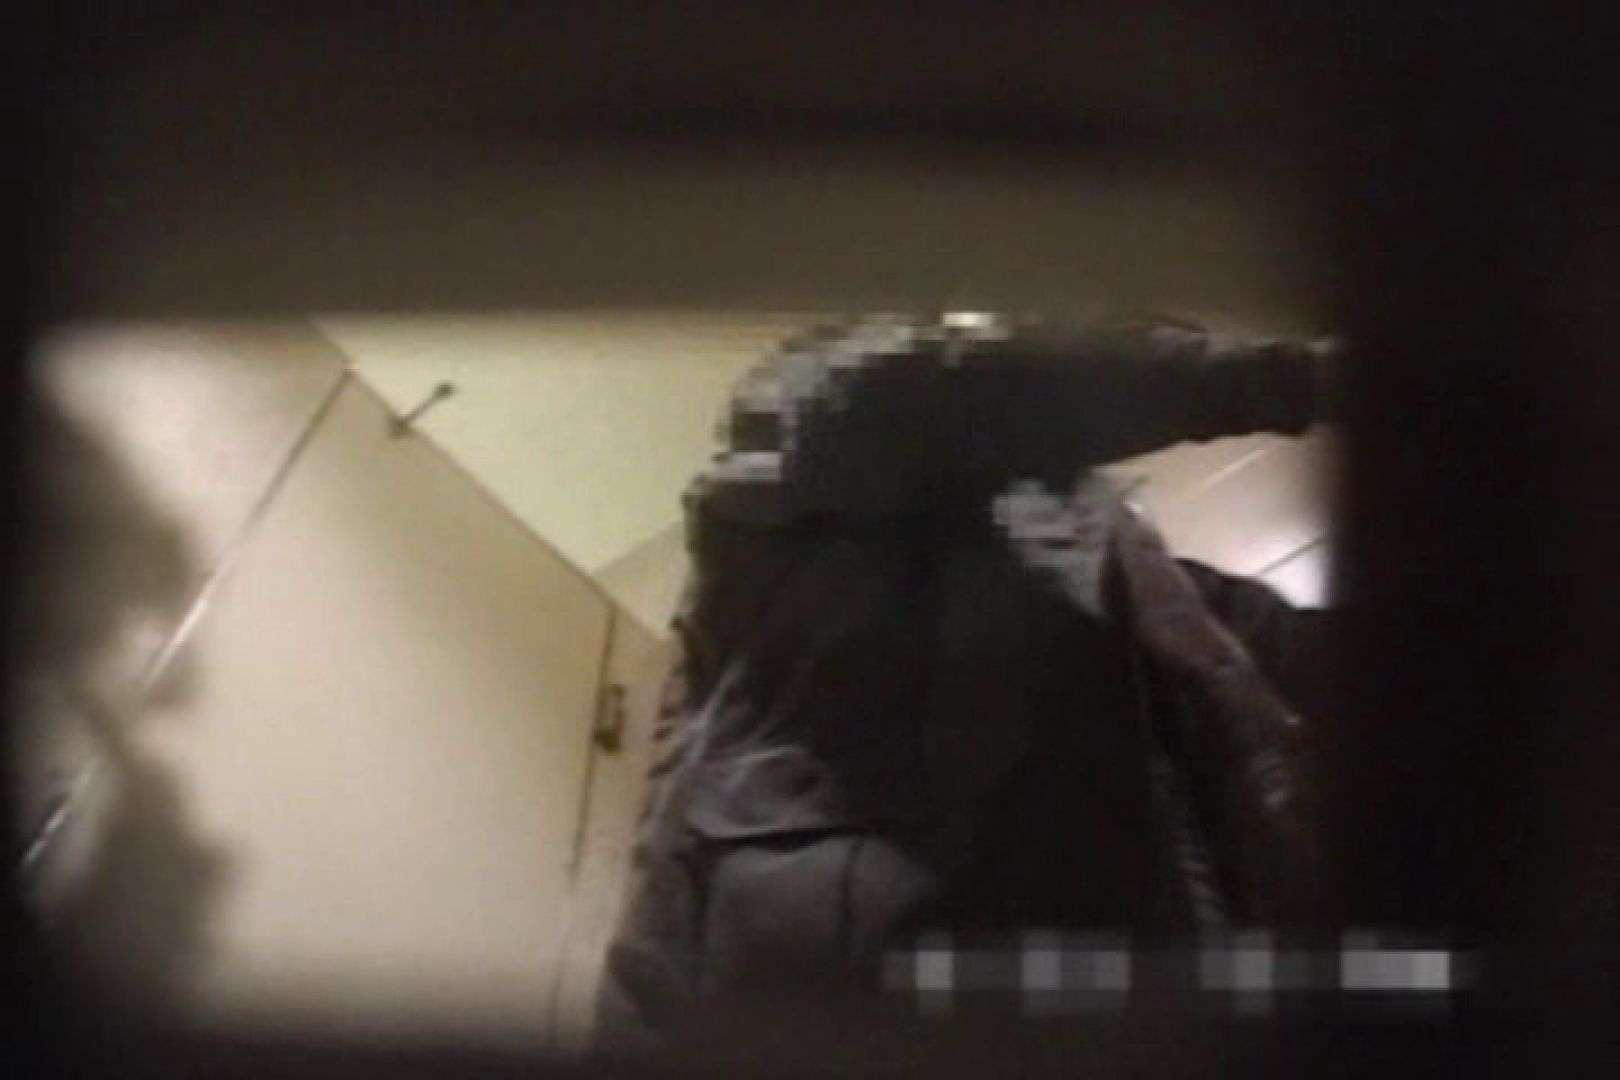 STY-013 実録!2カメde女子洗面所 洗面所 盗み撮り動画 113pic 2